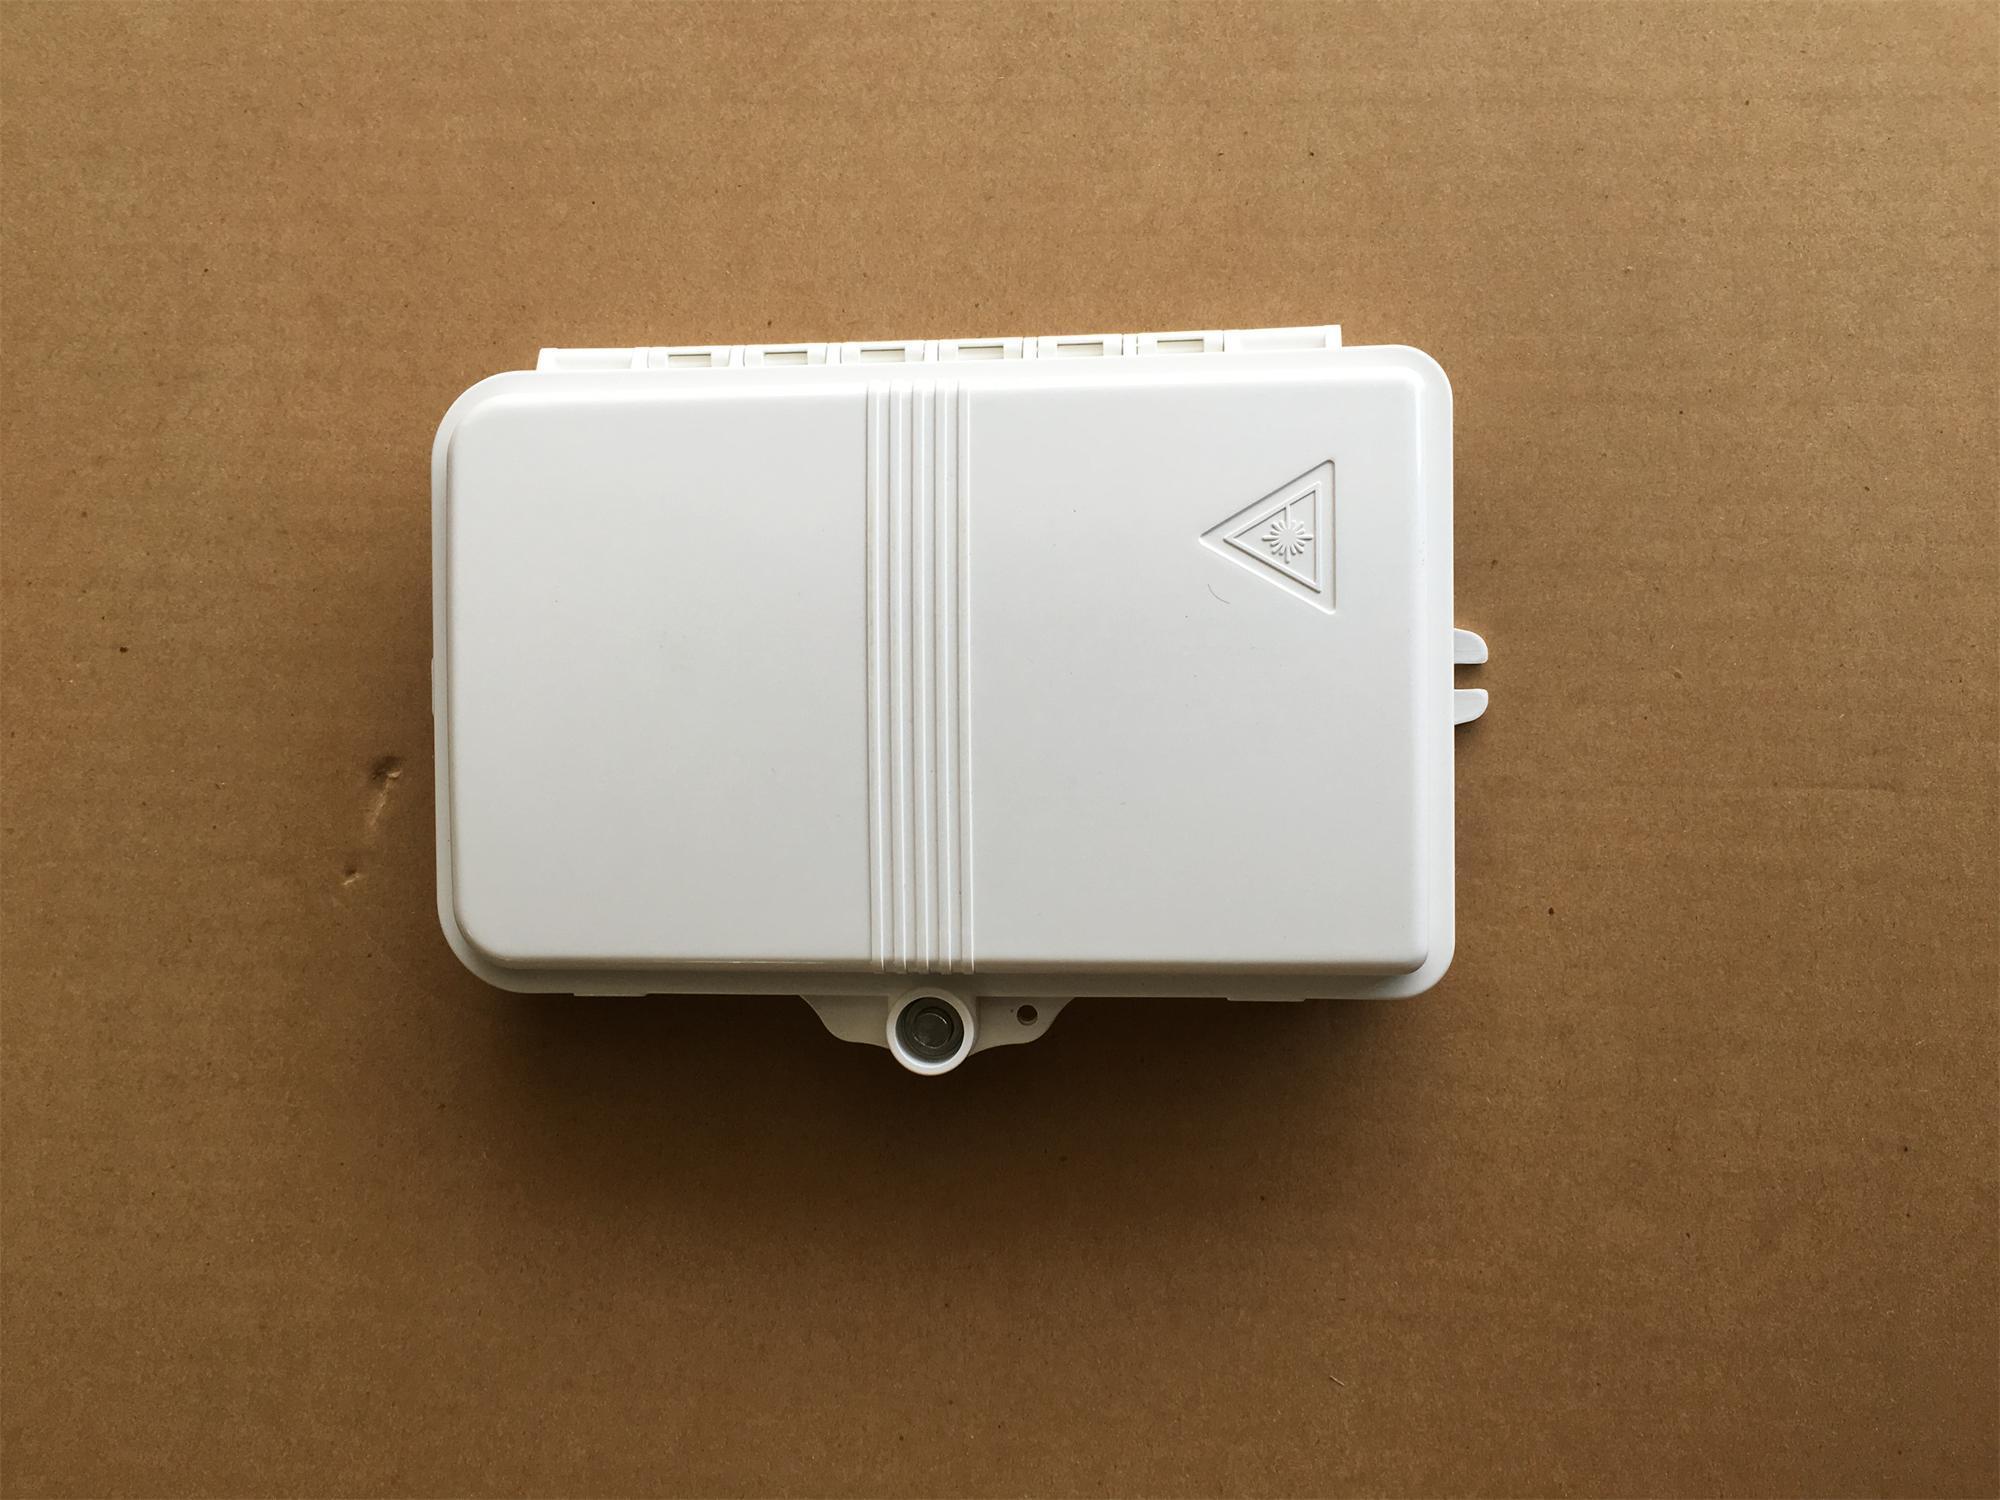 FTTH Outdoor Terminal Fiber Optic Distribution Box 2 Core Sc